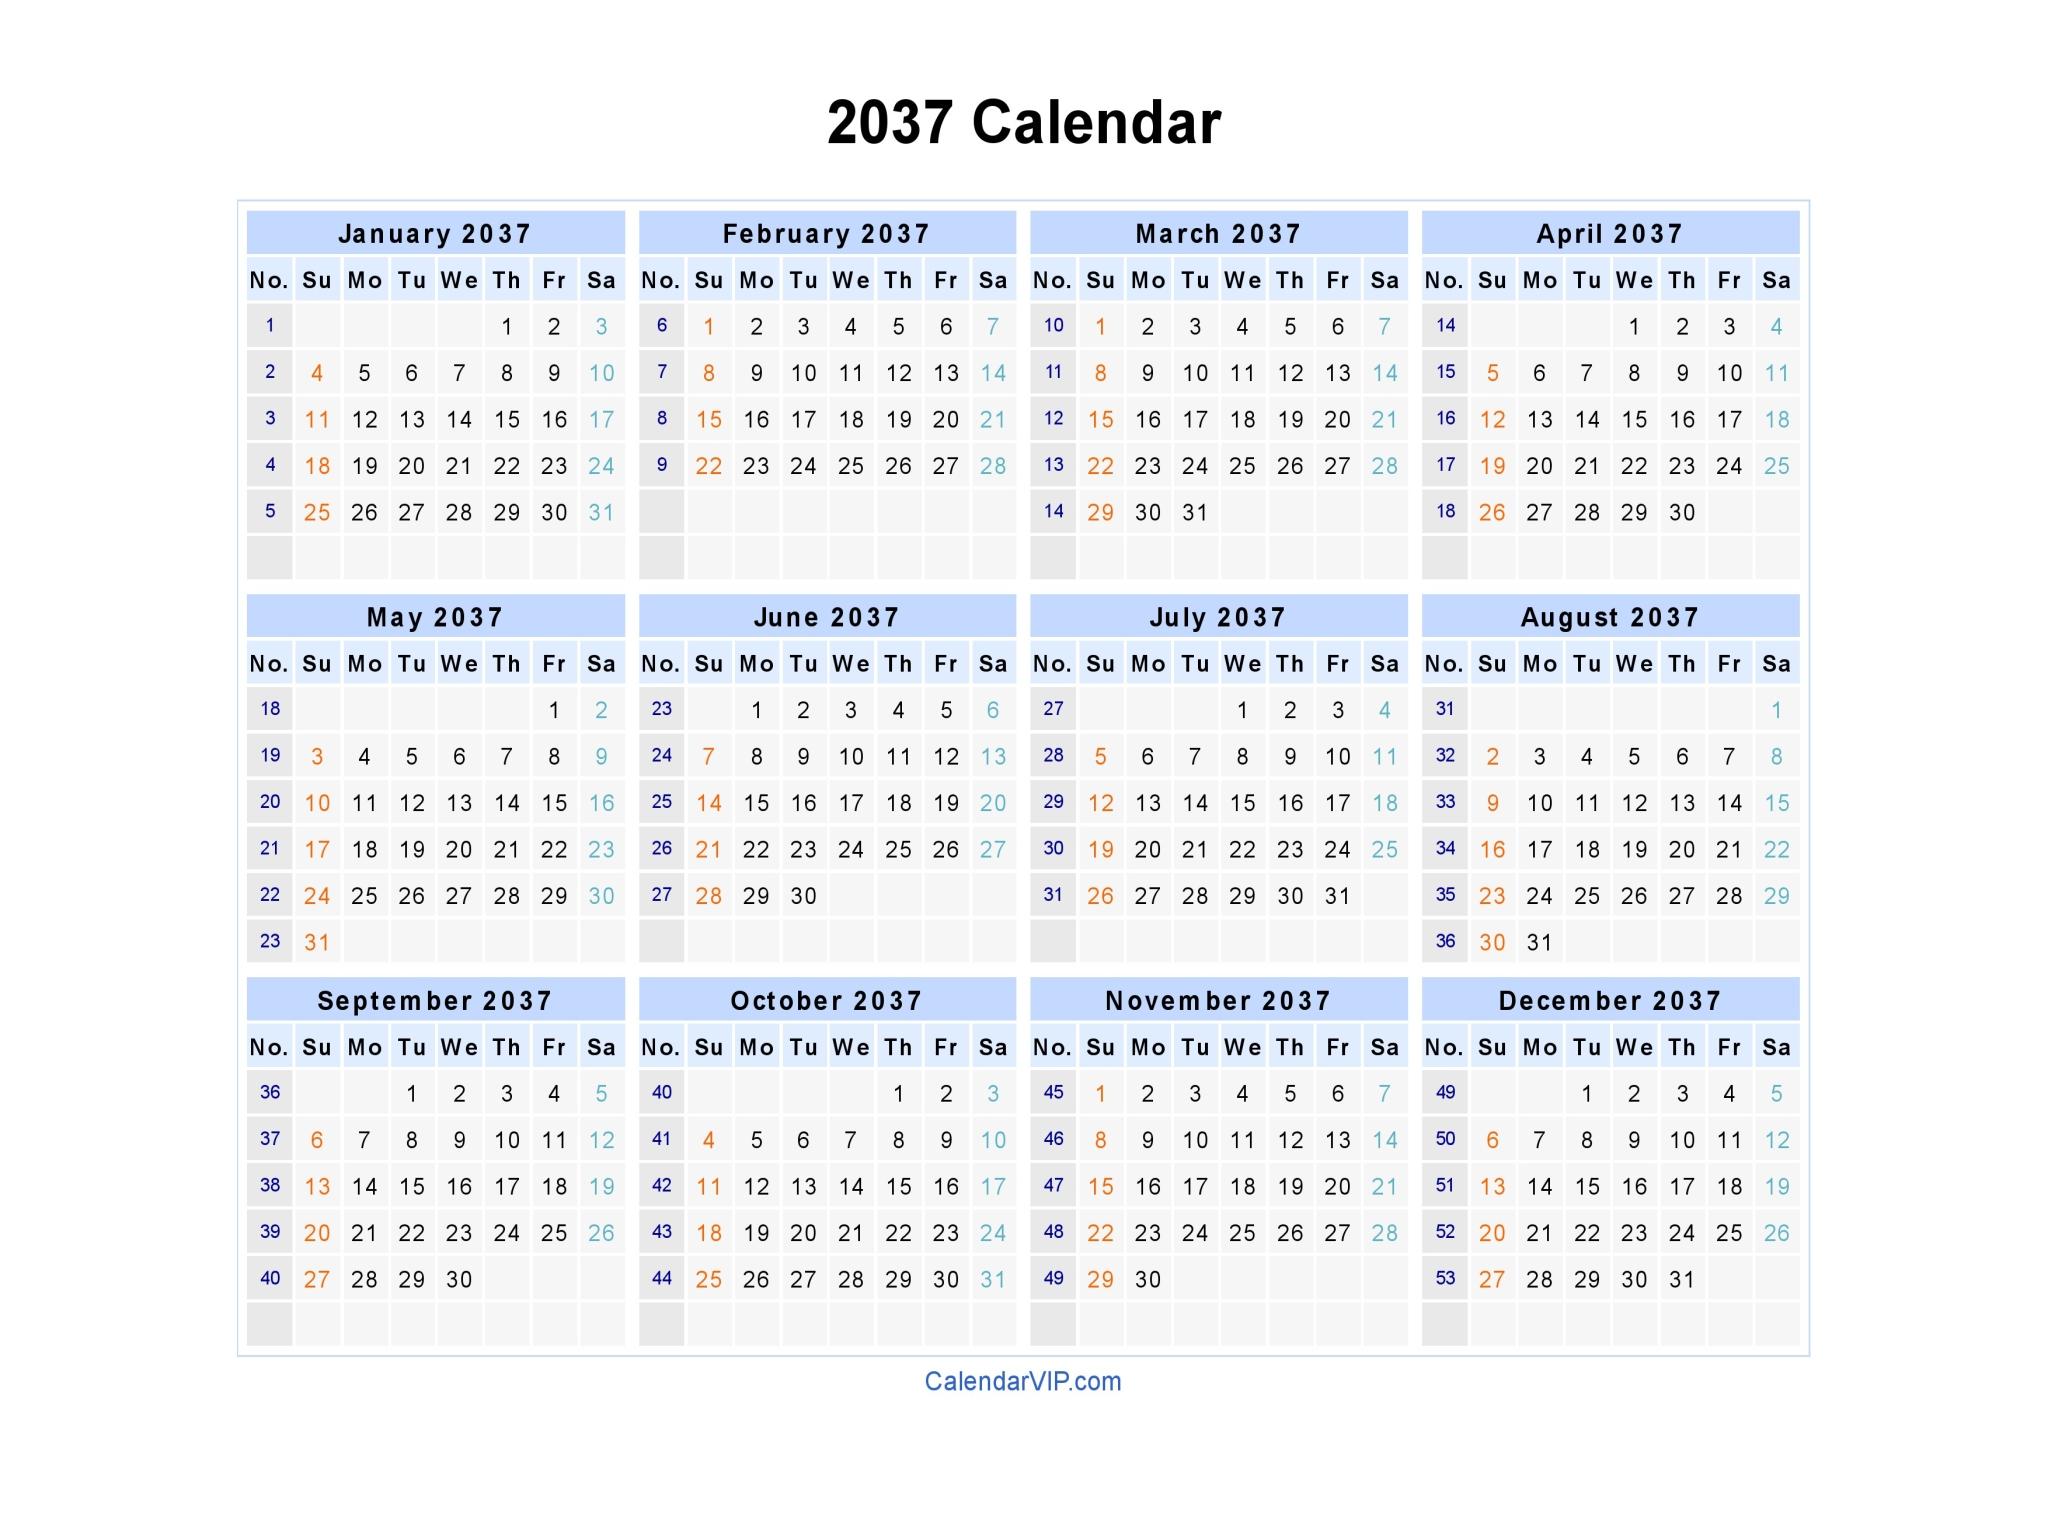 2037 calendar